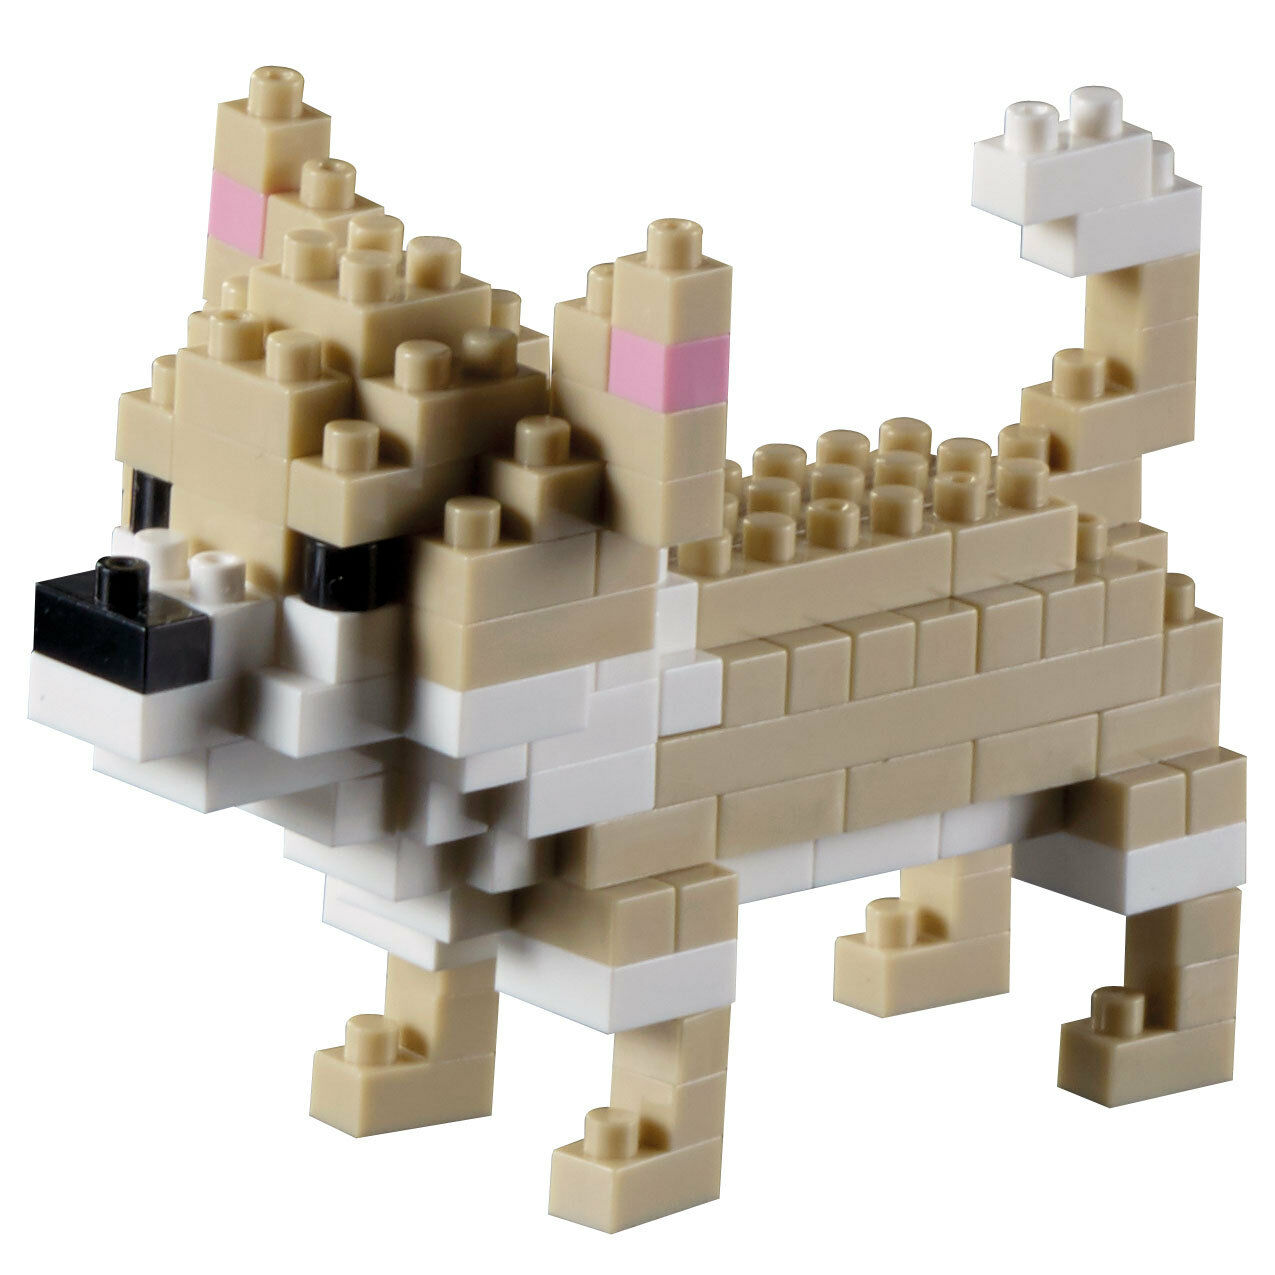 Brixies Chihuahua - Modelbausatz